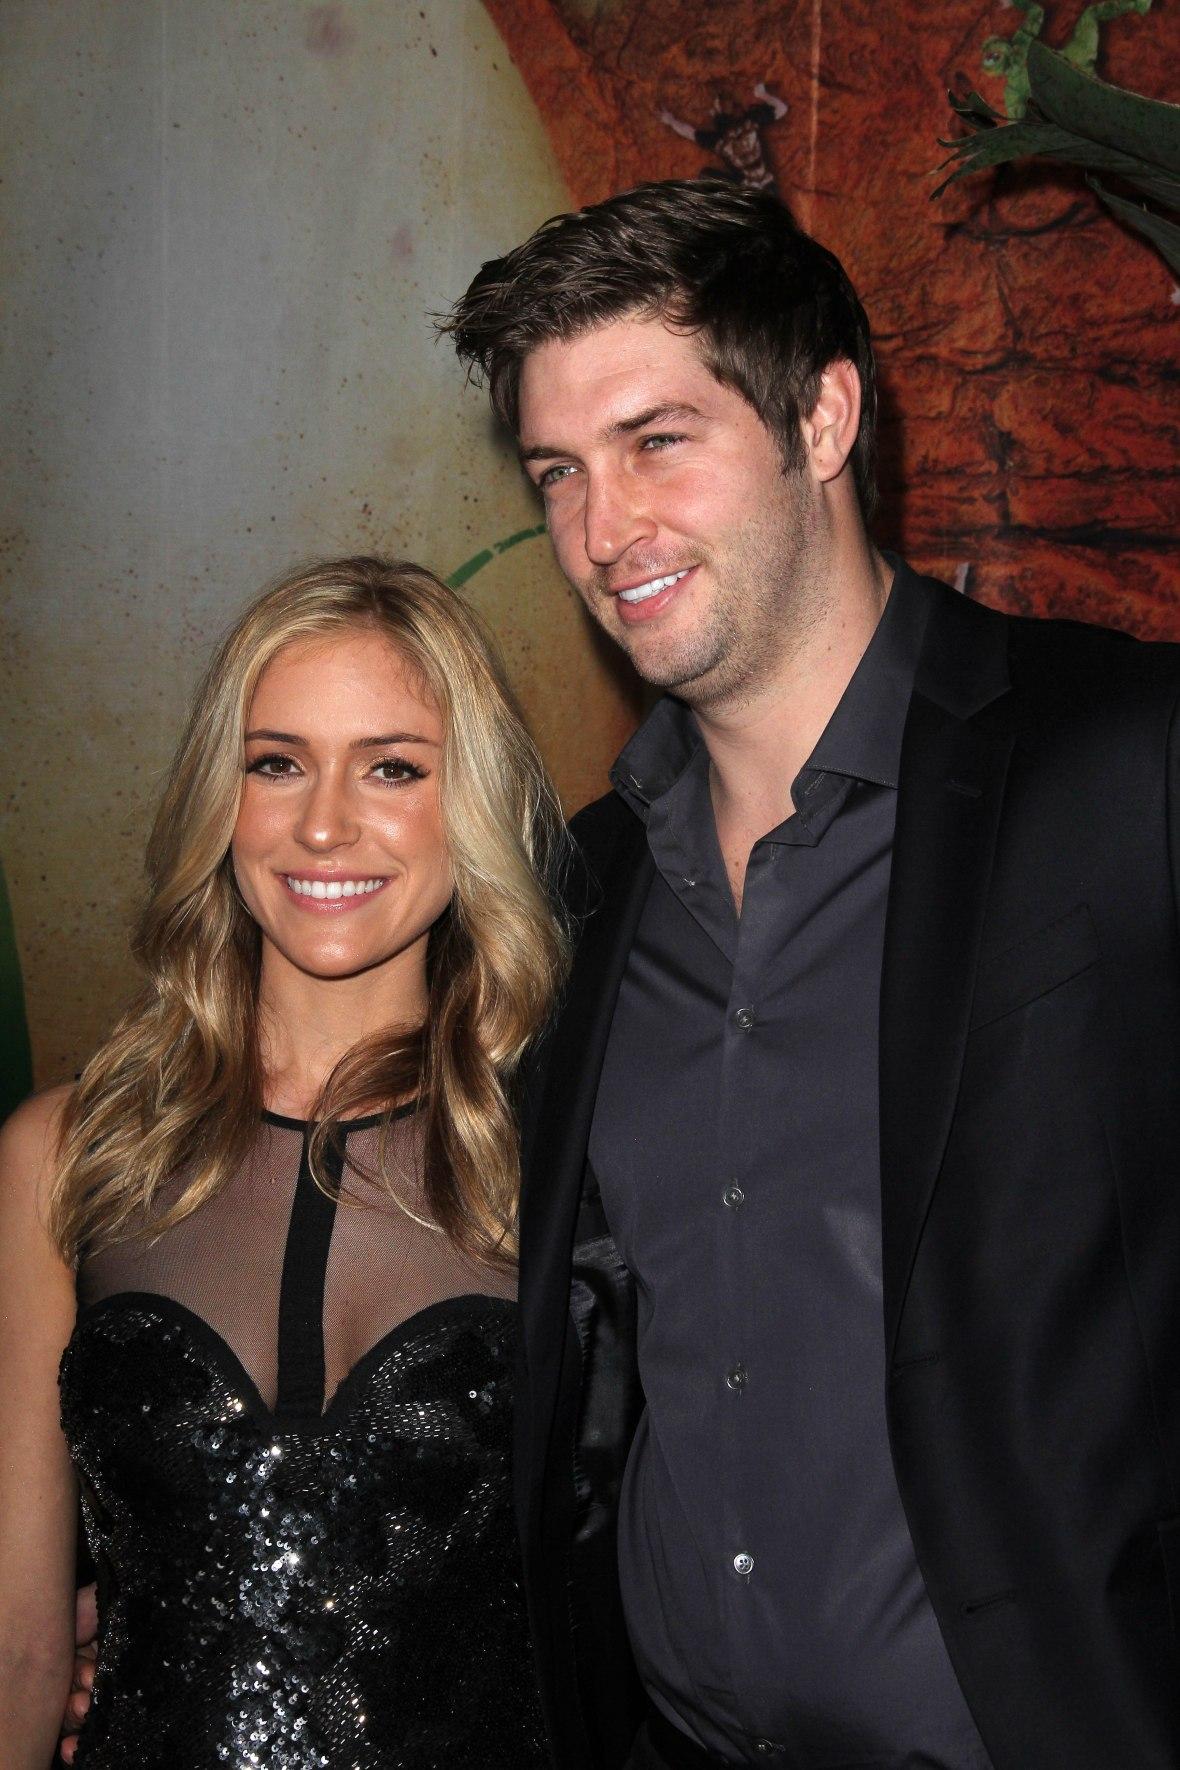 Why Did Kristin Cavallari and Jay Cutler Divorce